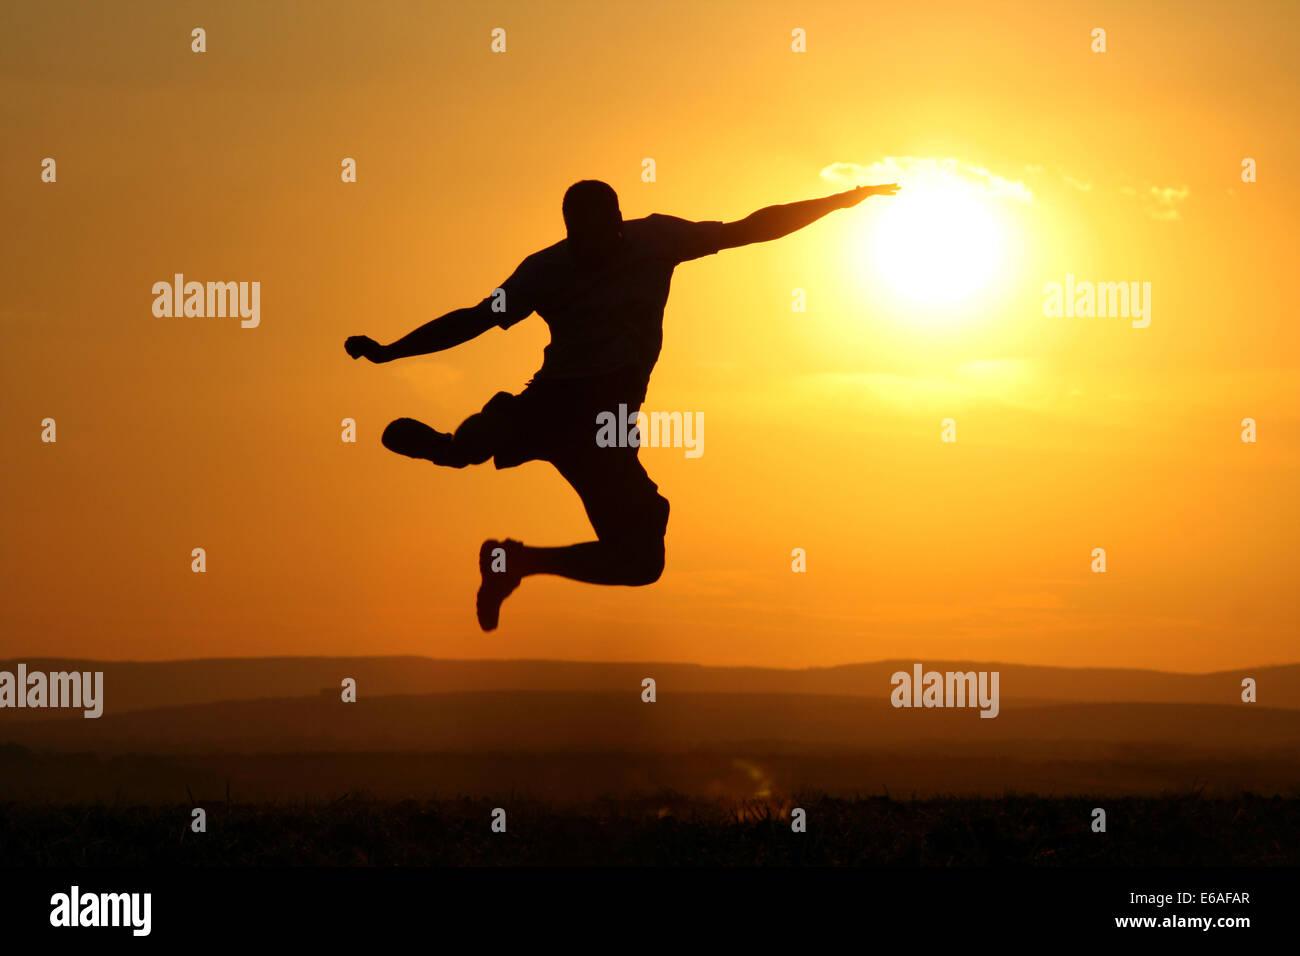 vitality,jump,jumping - Stock Image